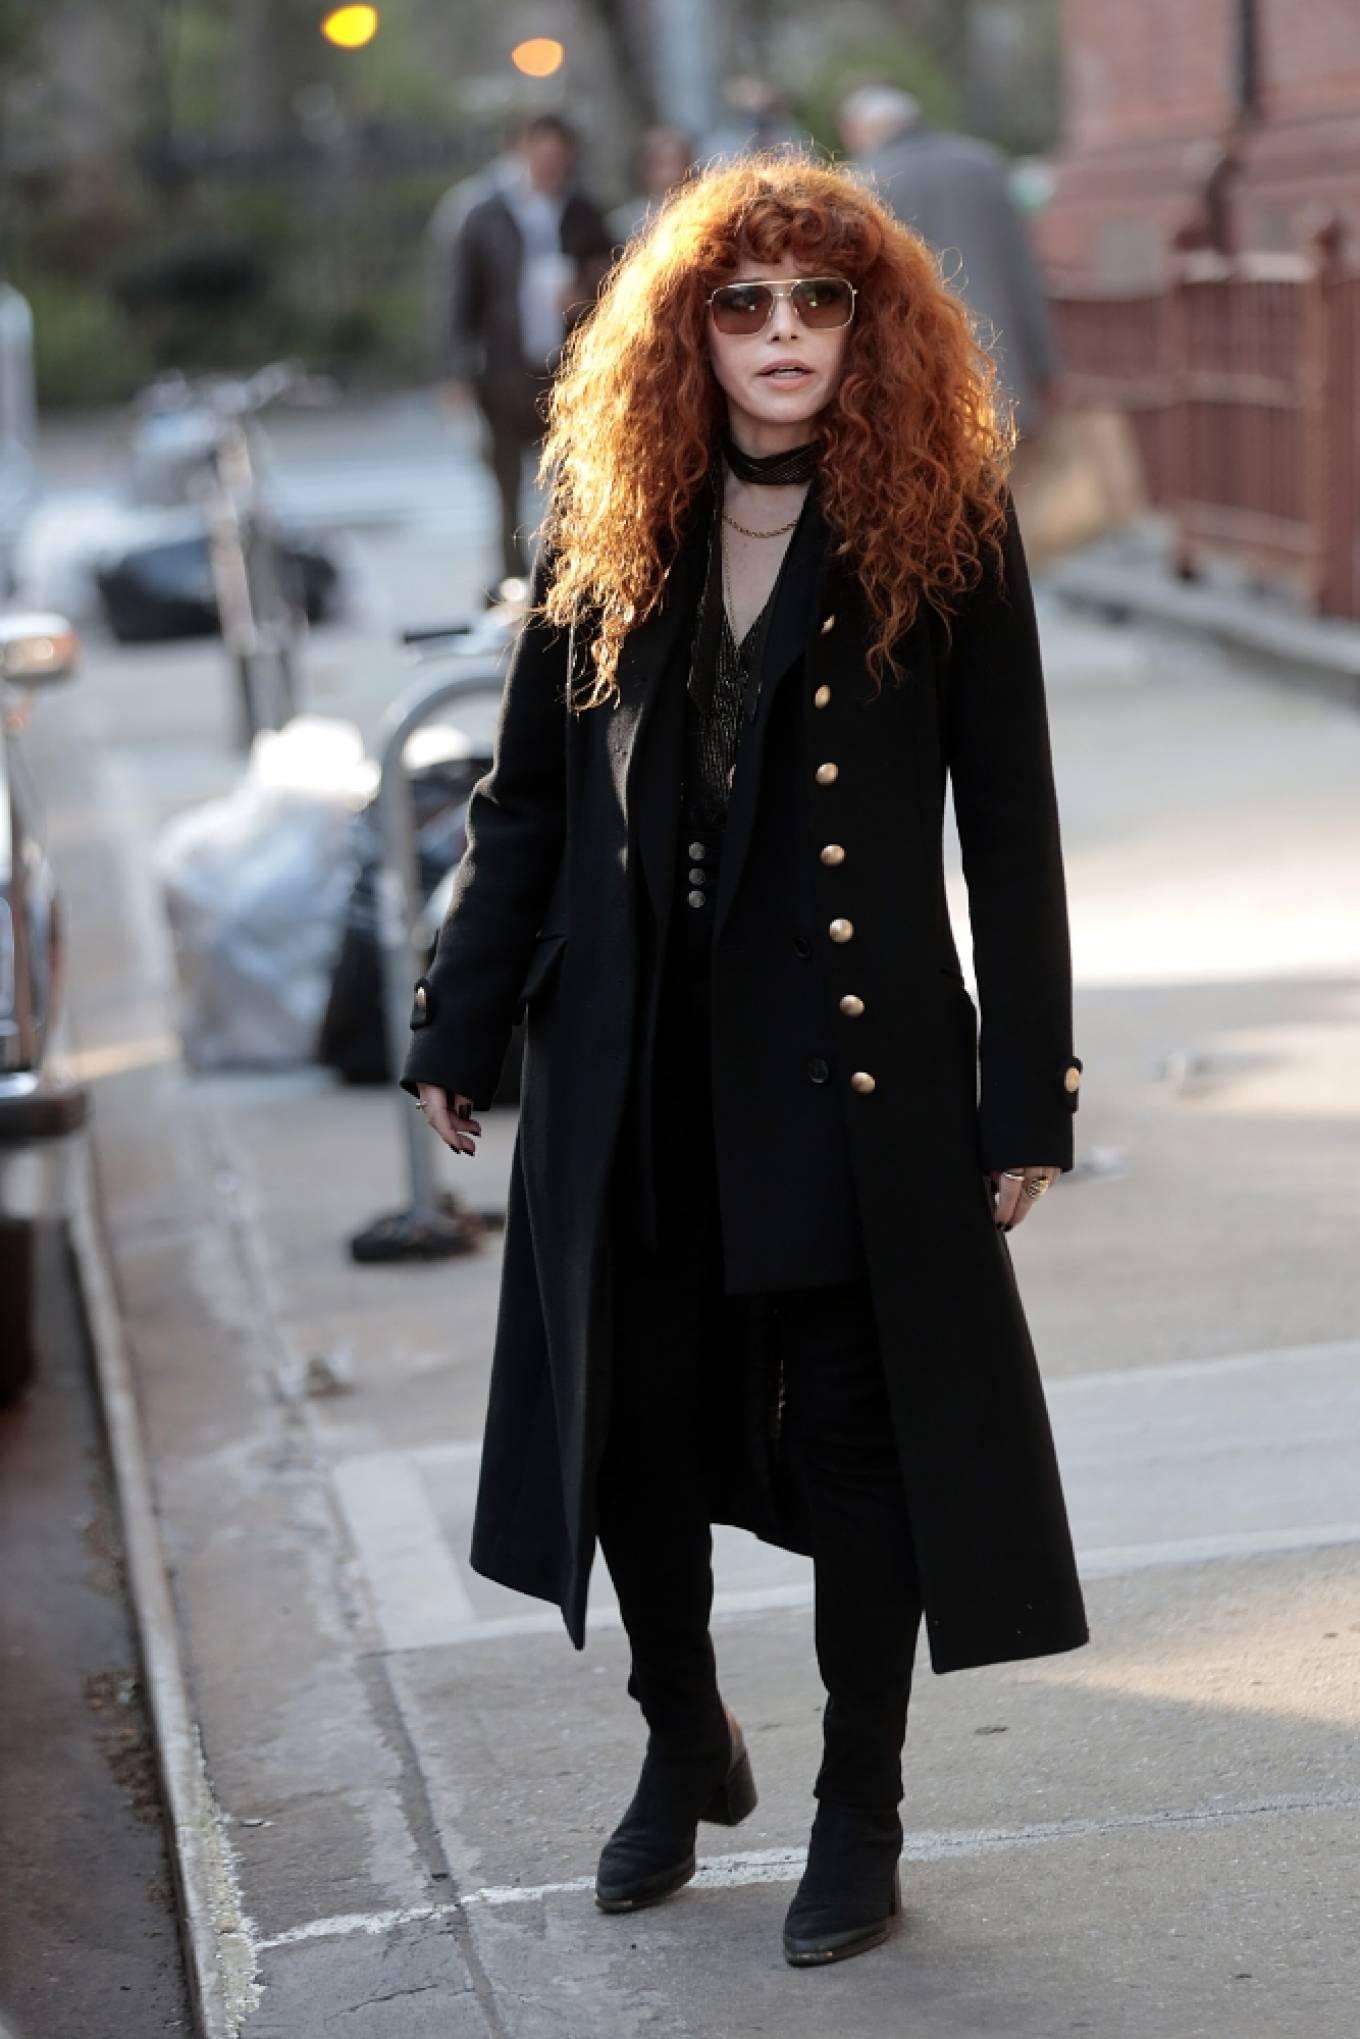 Natasha Lyonne - Filming 'Russian Doll' in New York